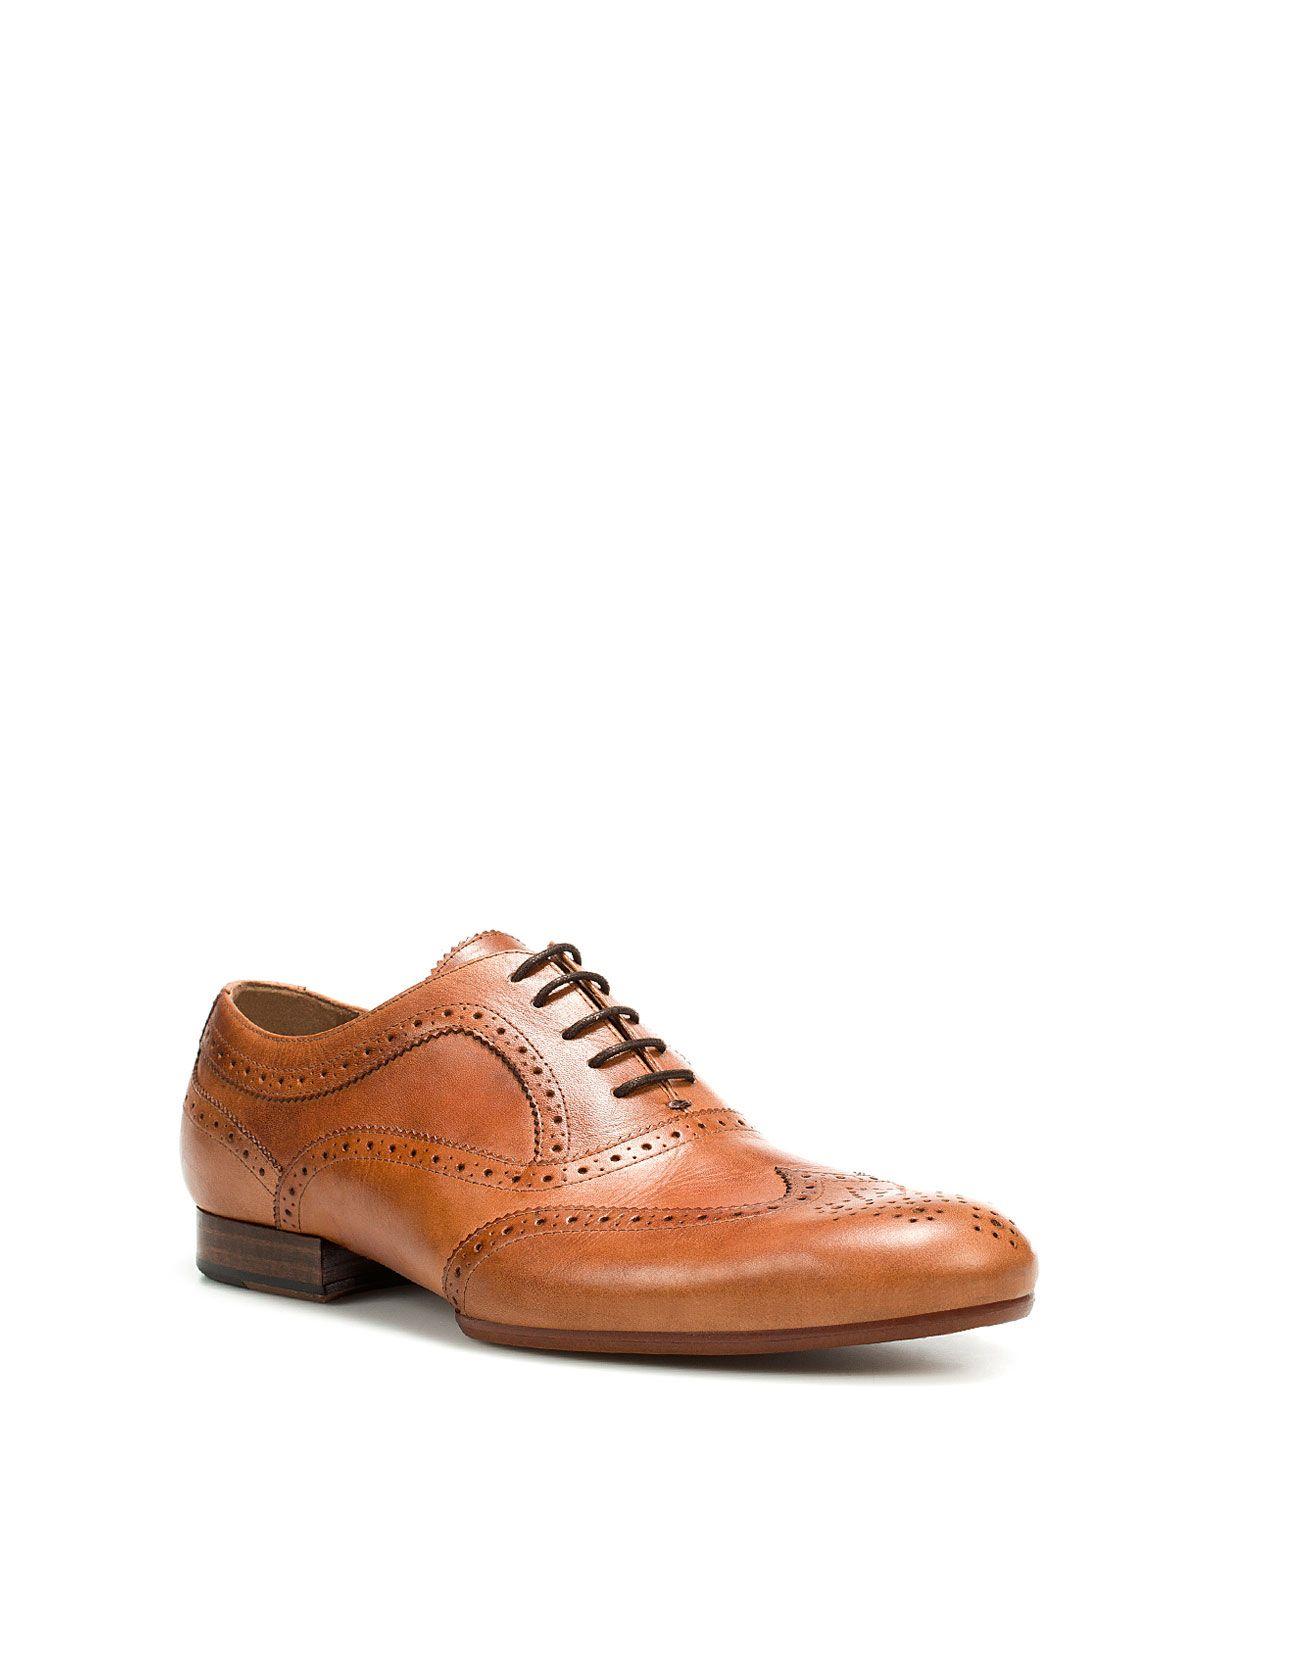 ebcd0e93c34 VINTAGE BROGUES - Shoes - Man - ZARA United States | je ne sais quoi ...